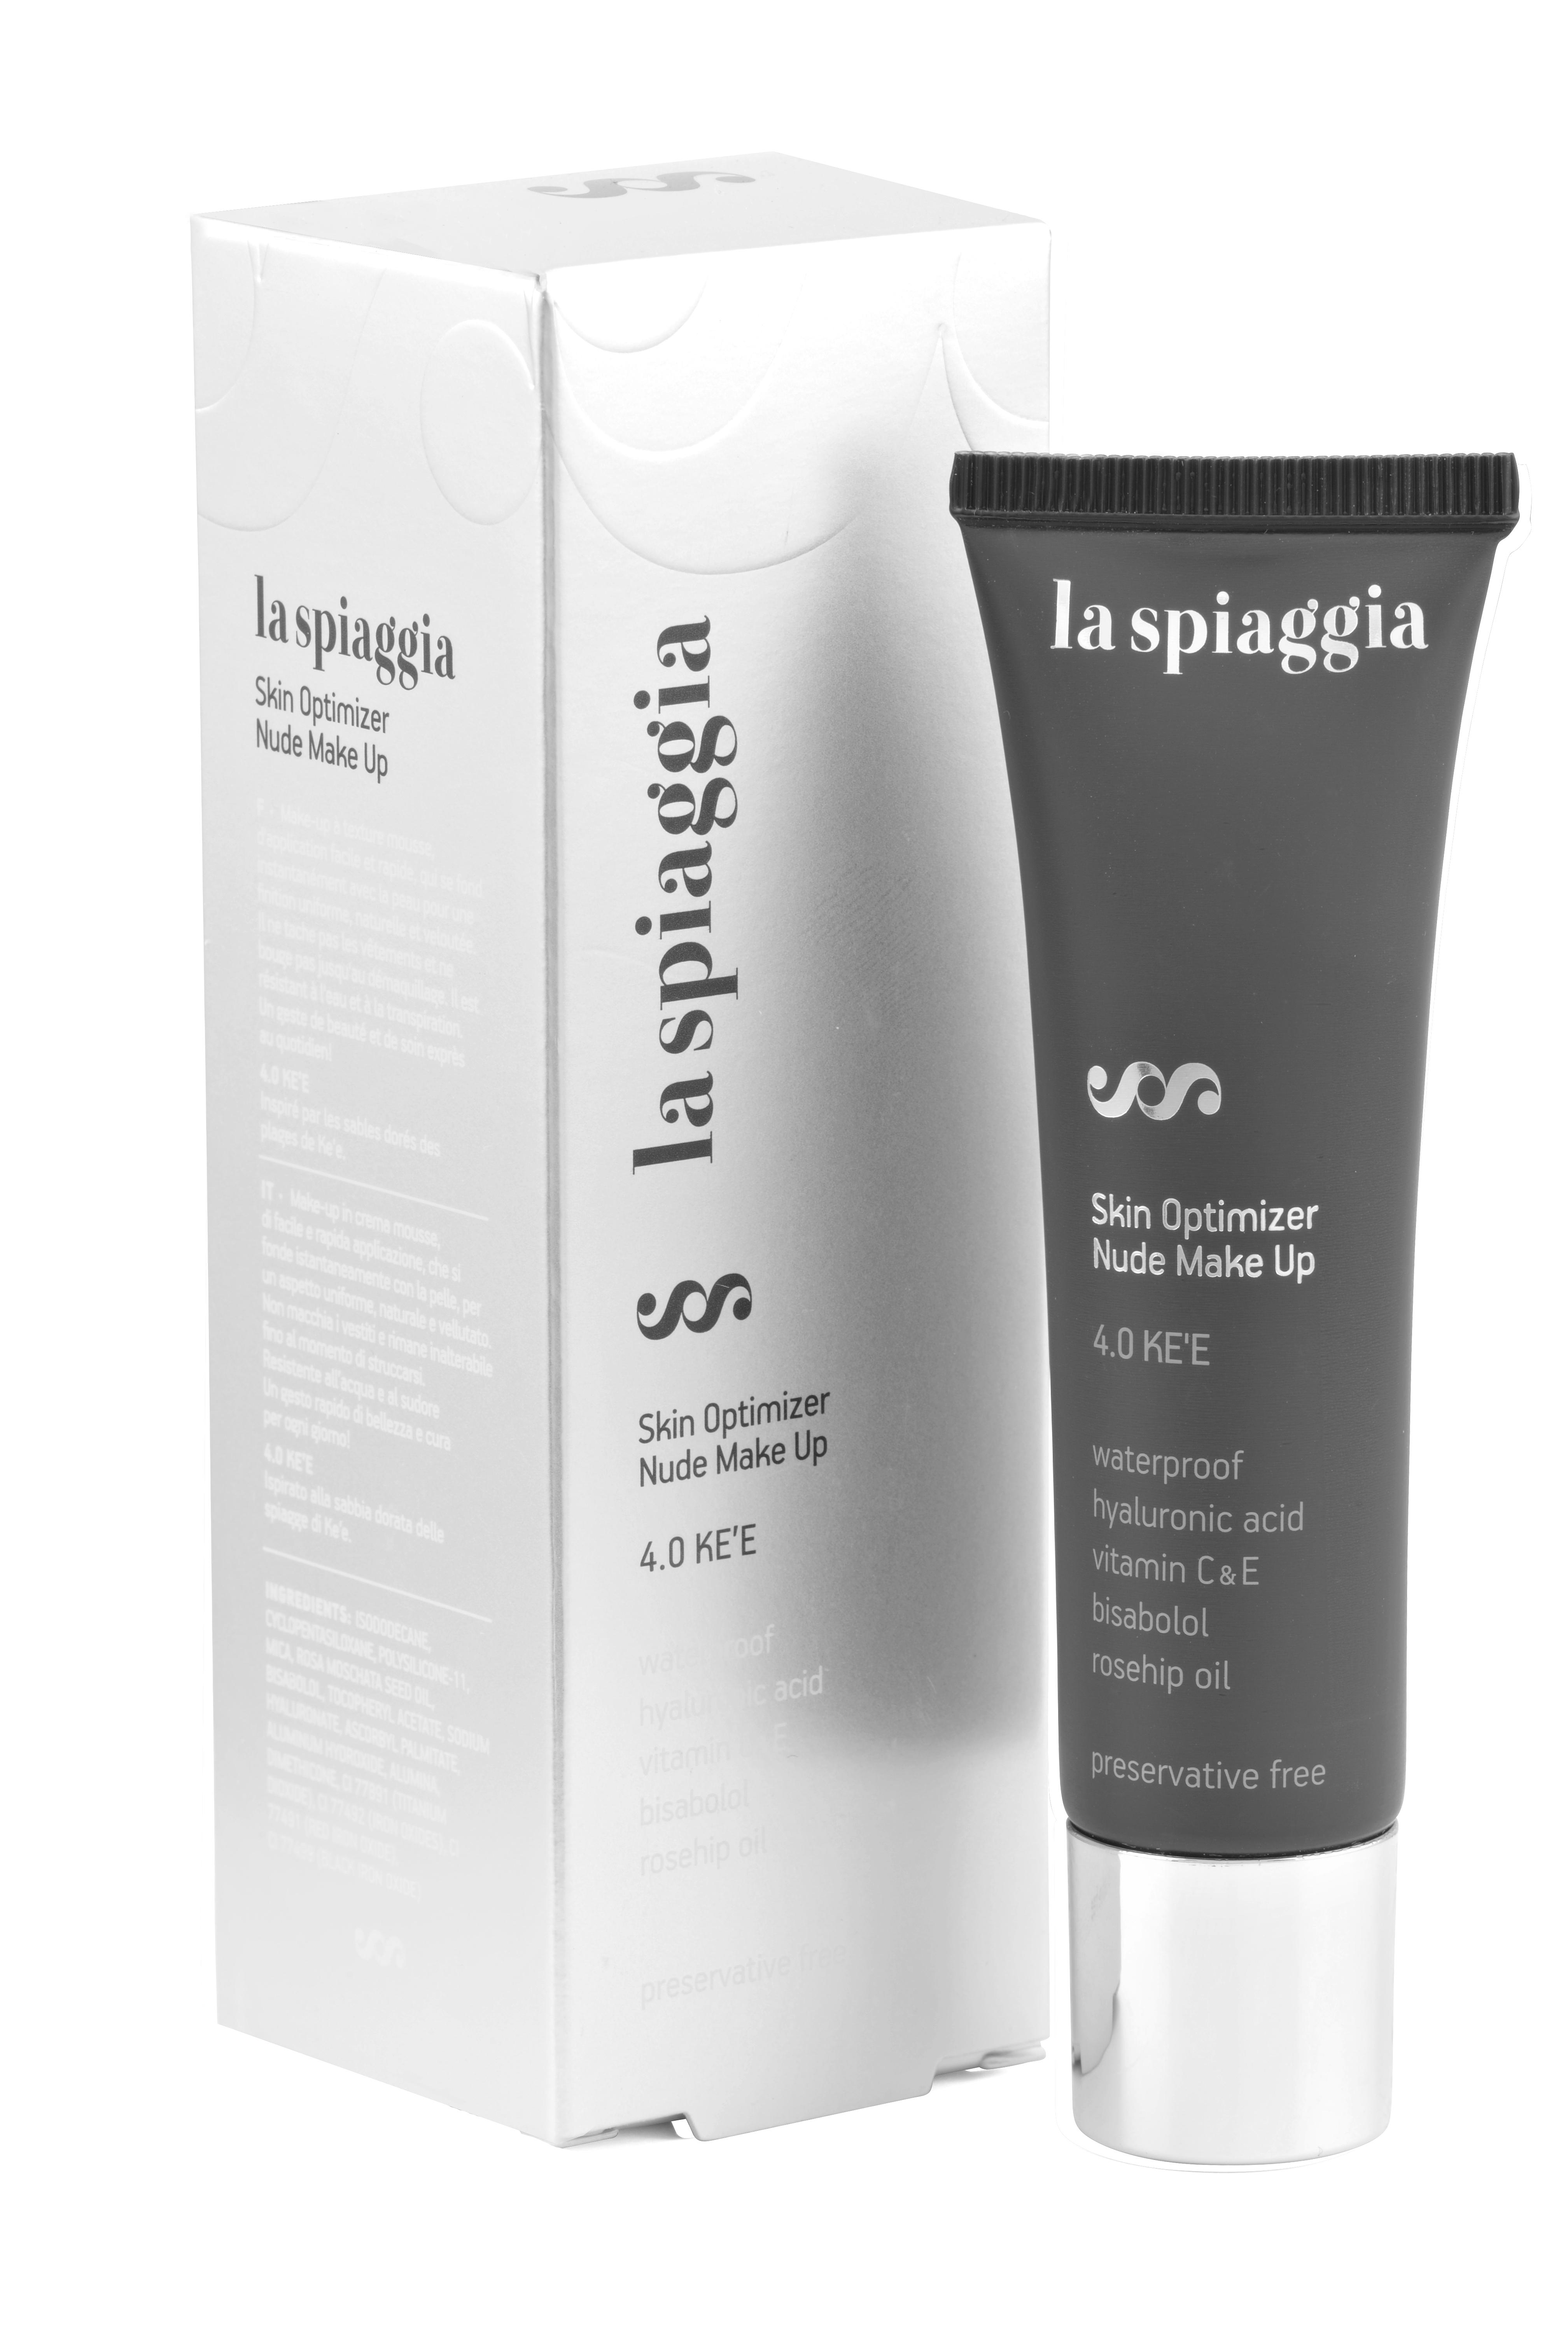 LA SPIAGGA Skin Optimizer Nude Make Up 4.0 Ke'e